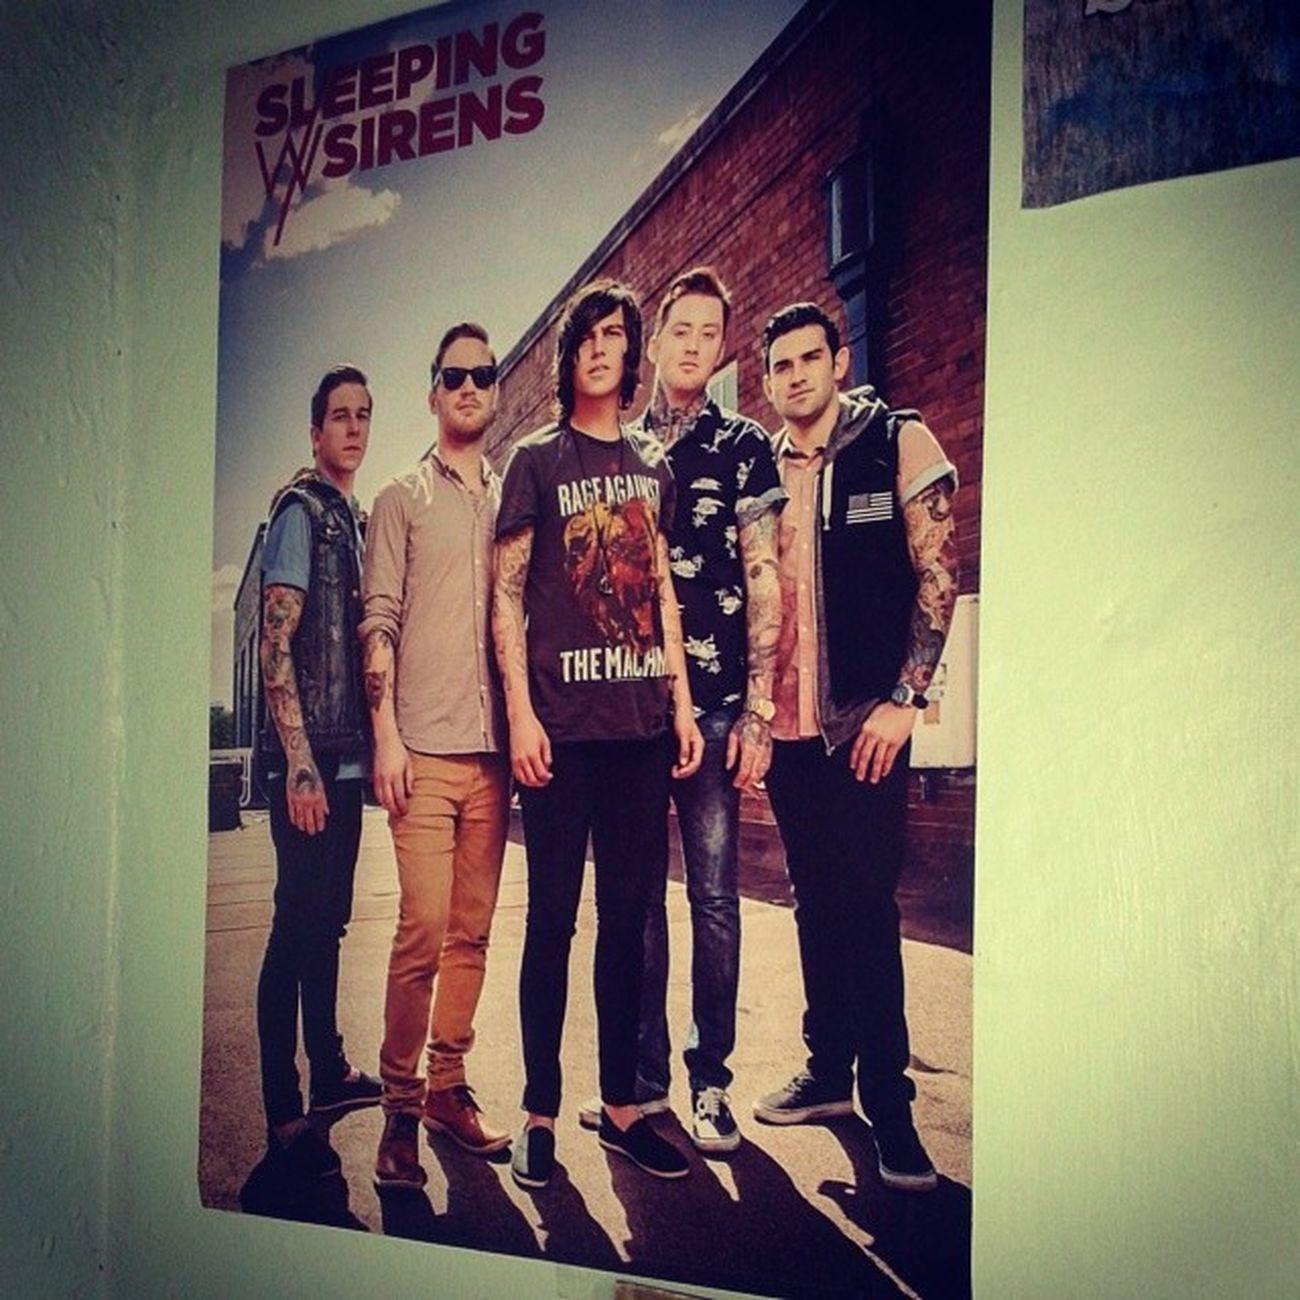 Mi poster♥ Sleepingwithsirens KellinQuinn Justinhills JackFowler GabeBarham tambien sale Jesse :')